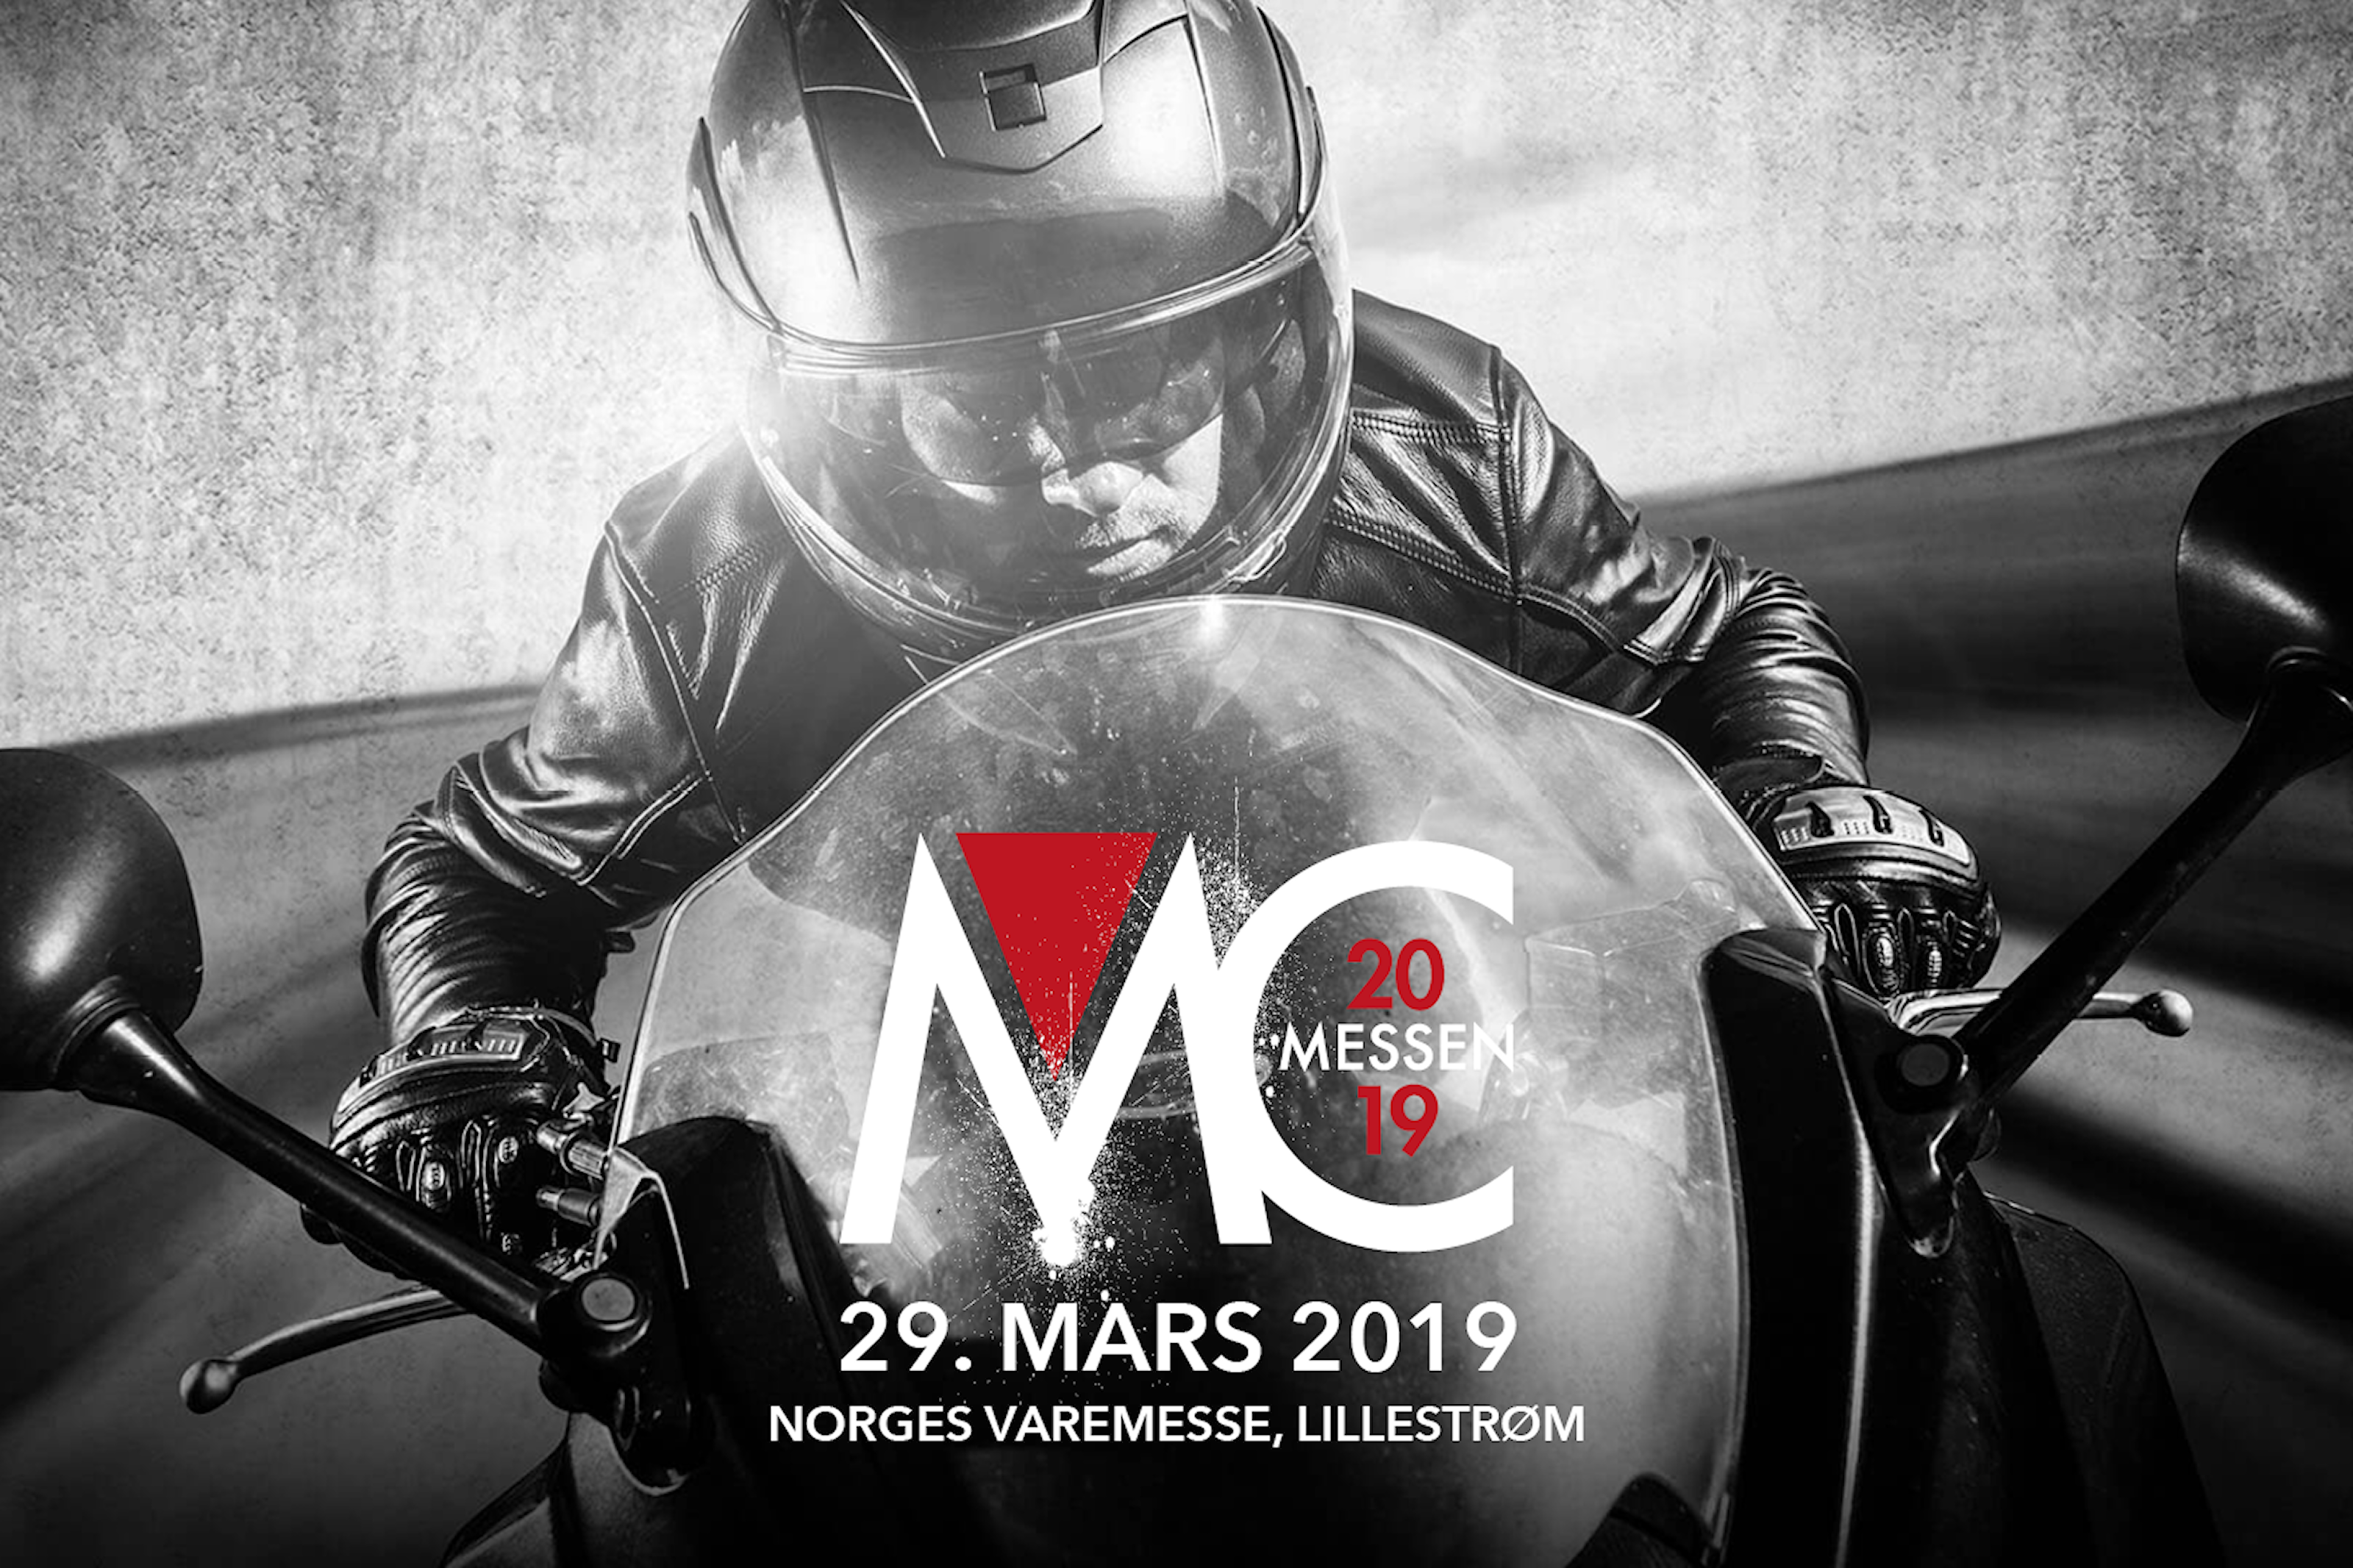 Billett til MC-Messen 29. mars 2019